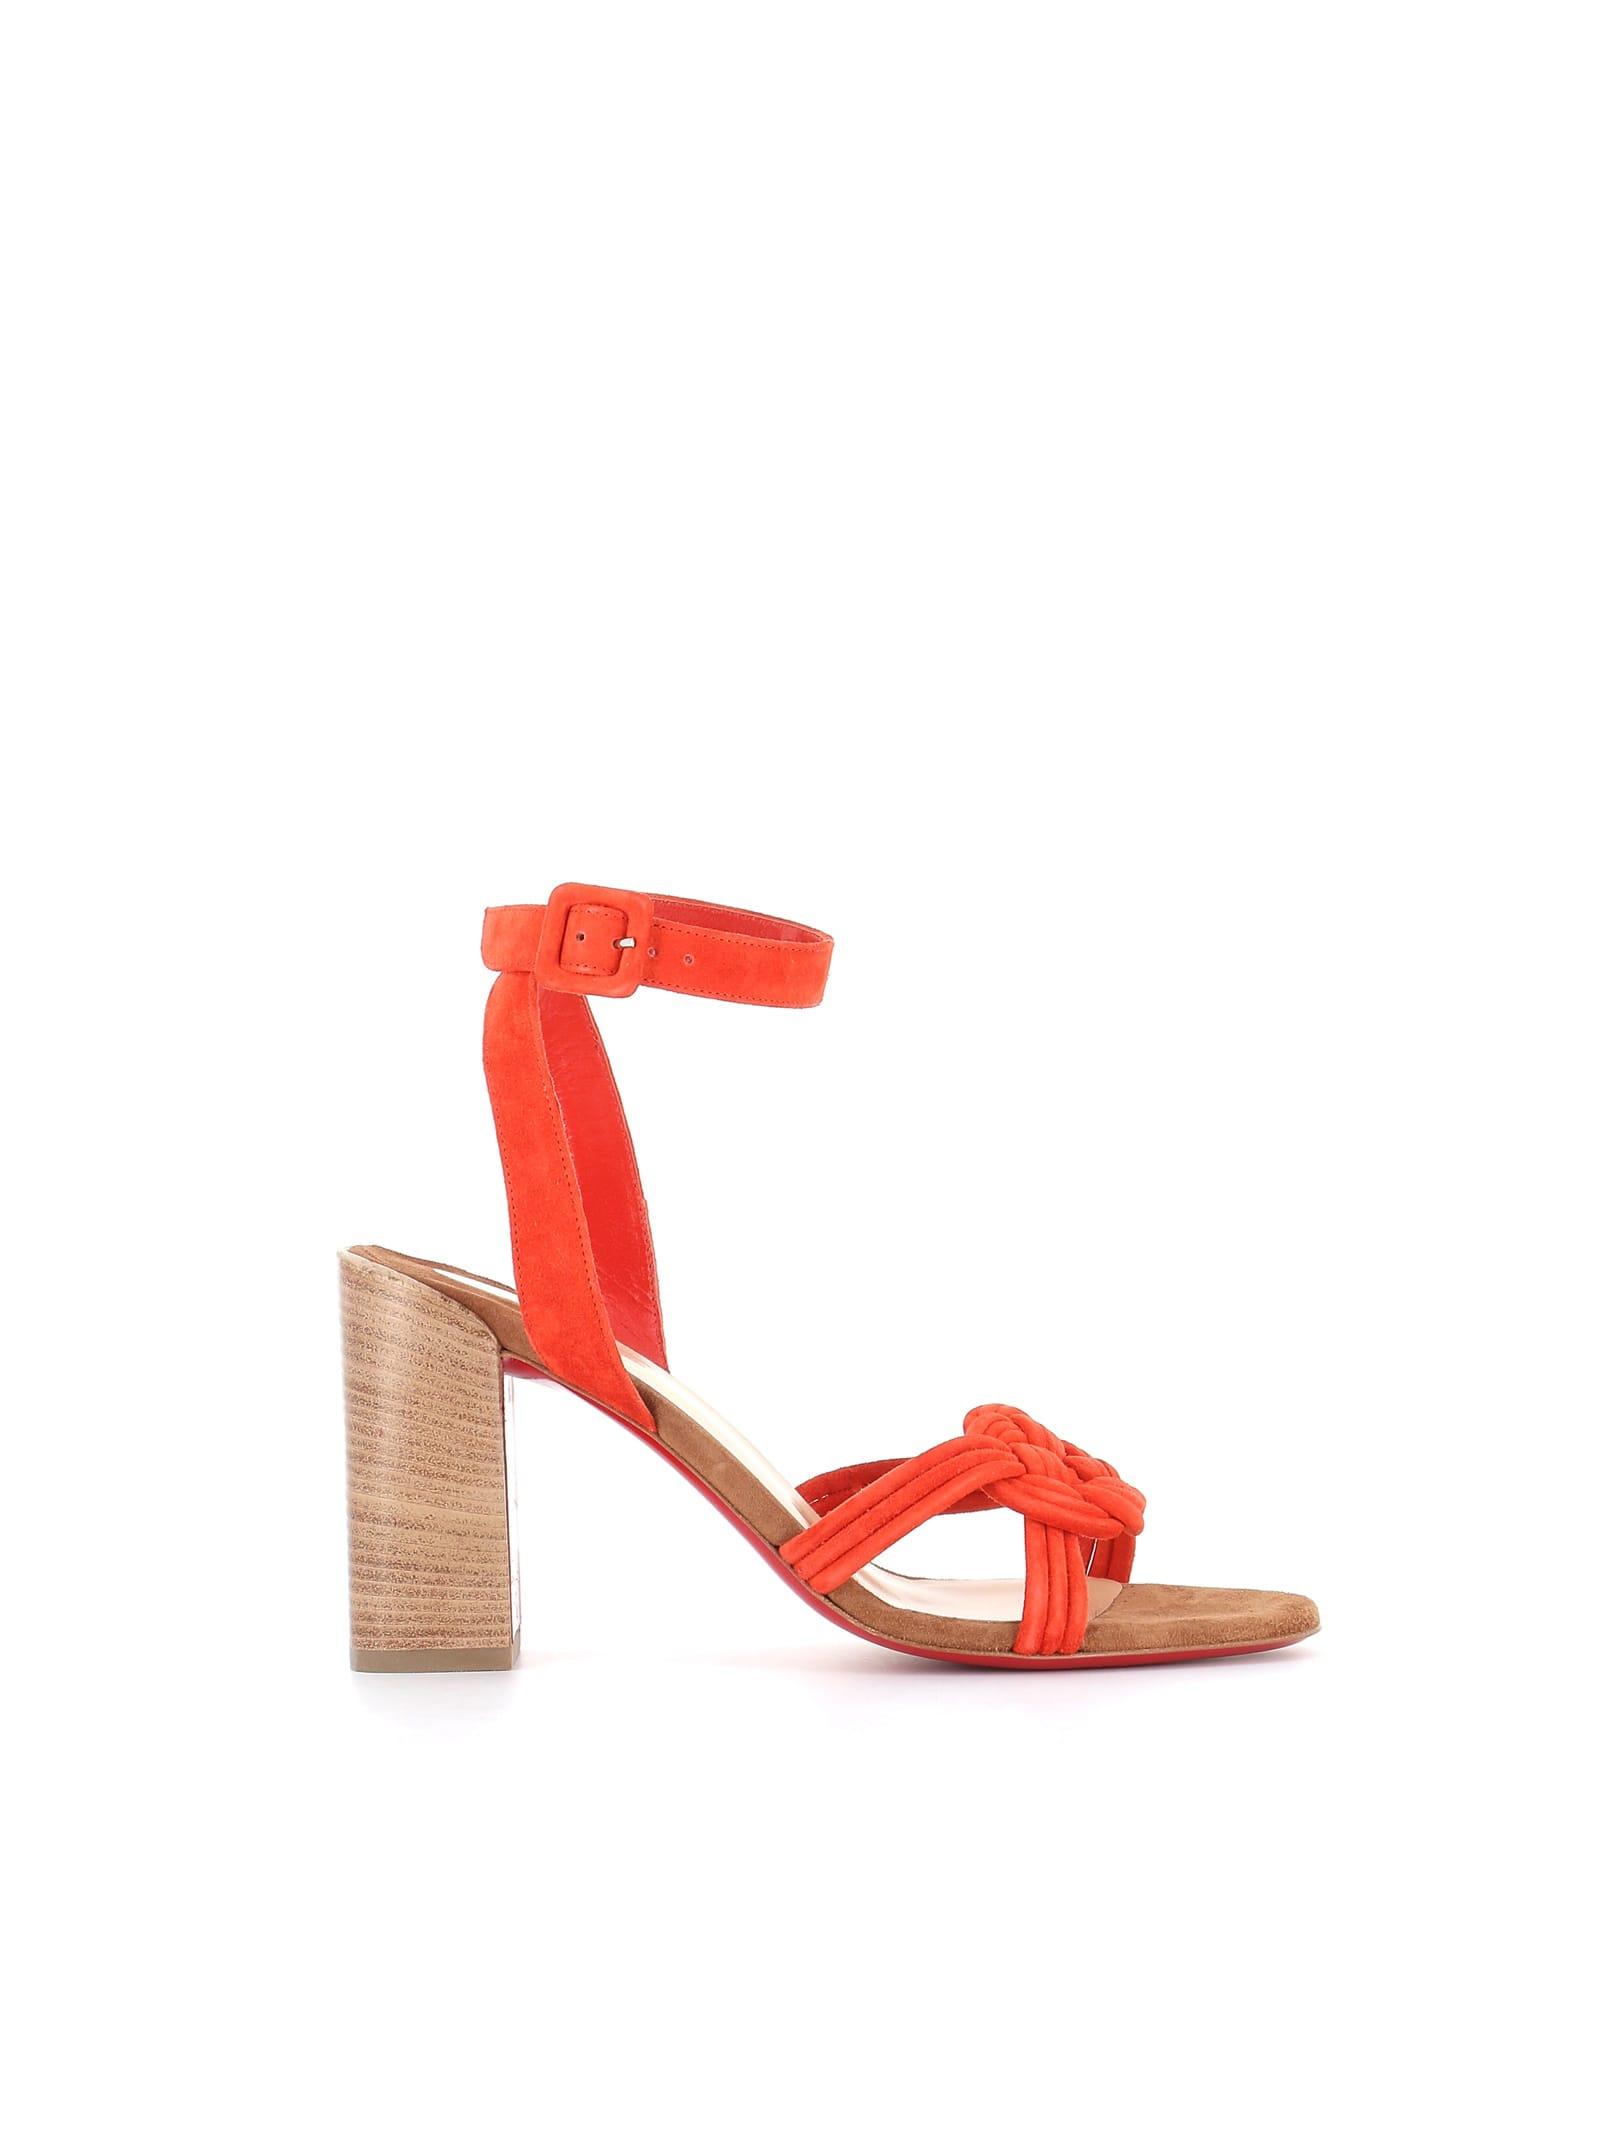 Buy Christian Louboutin Sandalo Ella 85 online, shop Christian Louboutin shoes with free shipping